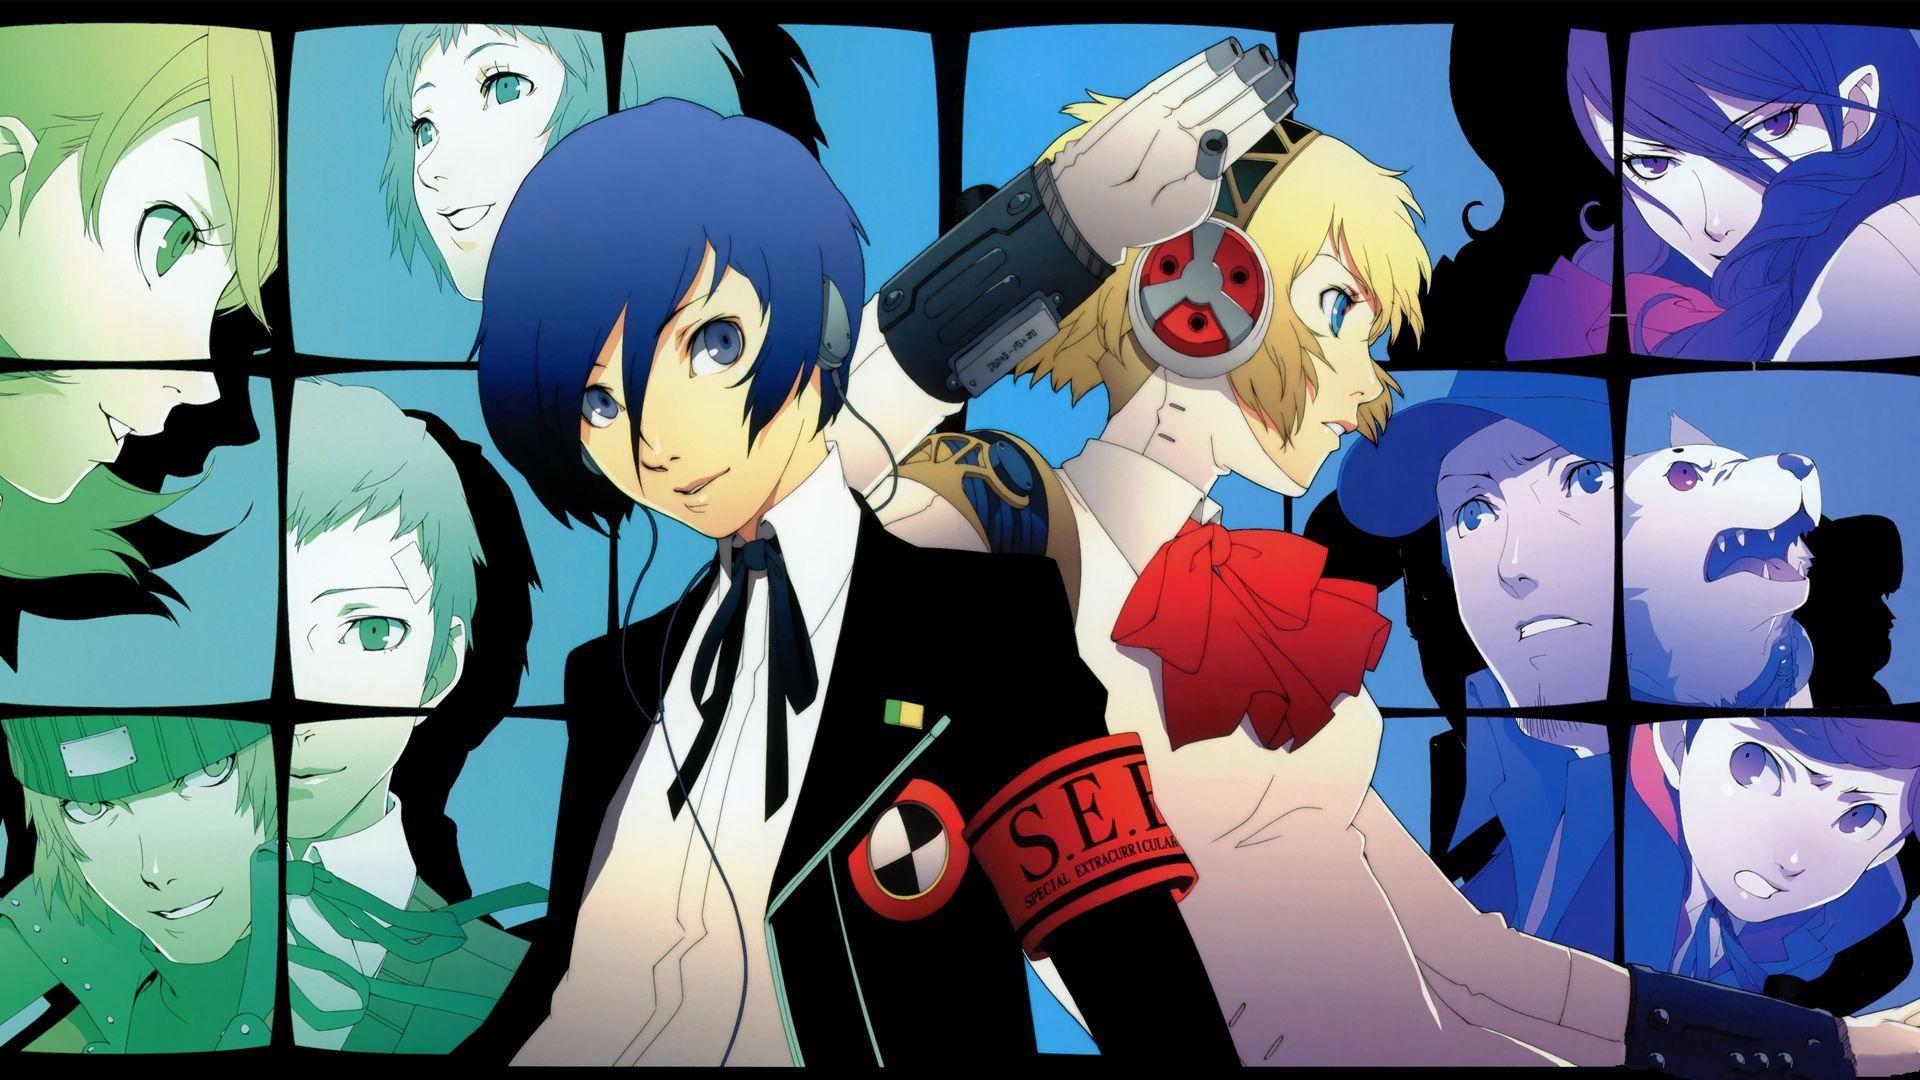 wallpaper.wiki-Persona-3-Fes-Wallpaper-PIC-WPE002007